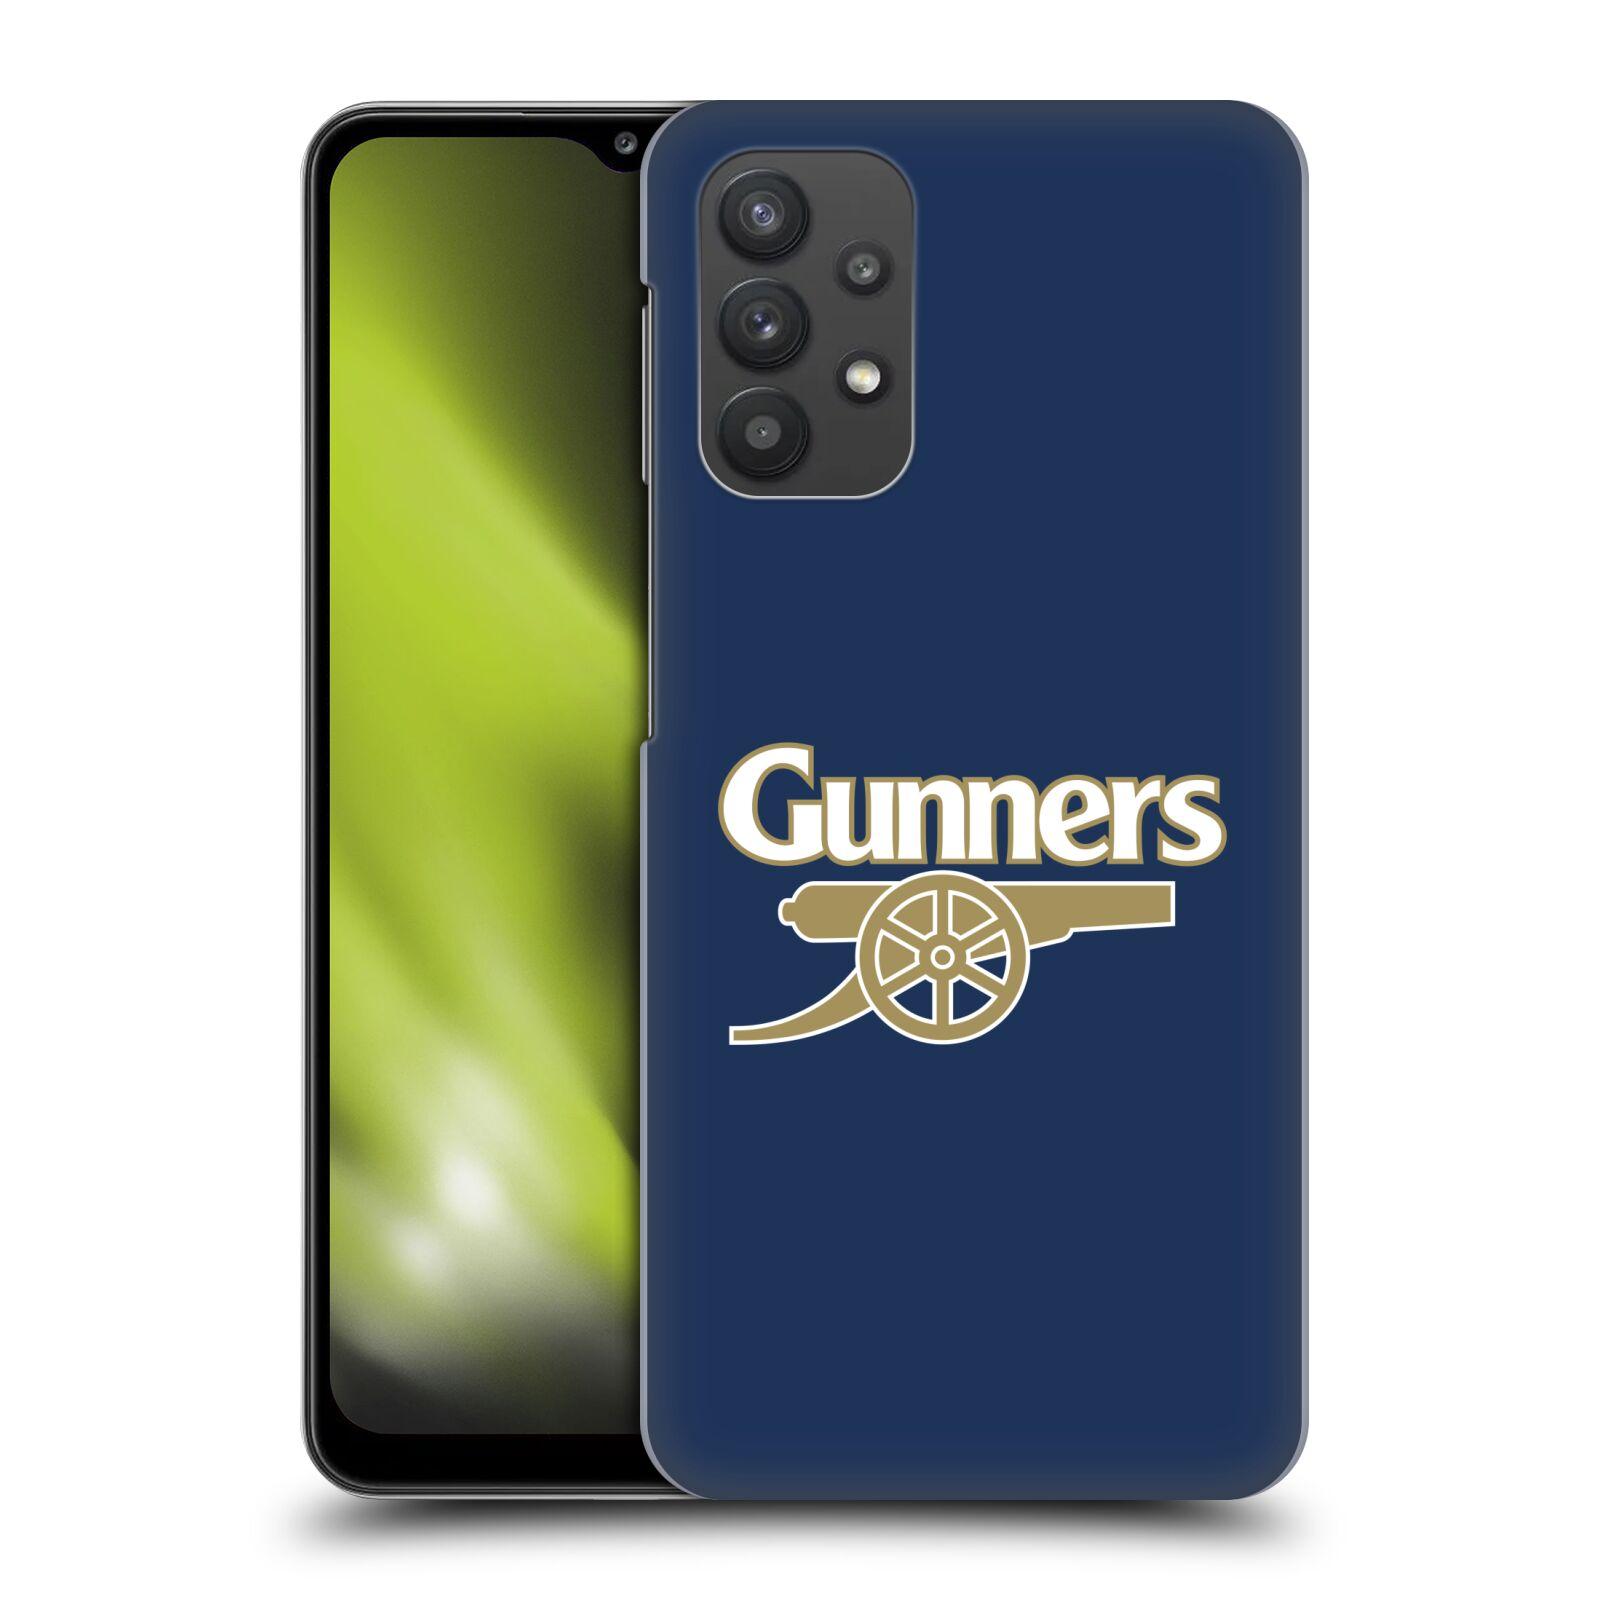 Plastové pouzdro na mobil Samsung Galaxy A32 5G - Head Case - Arsenal FC - Gunners